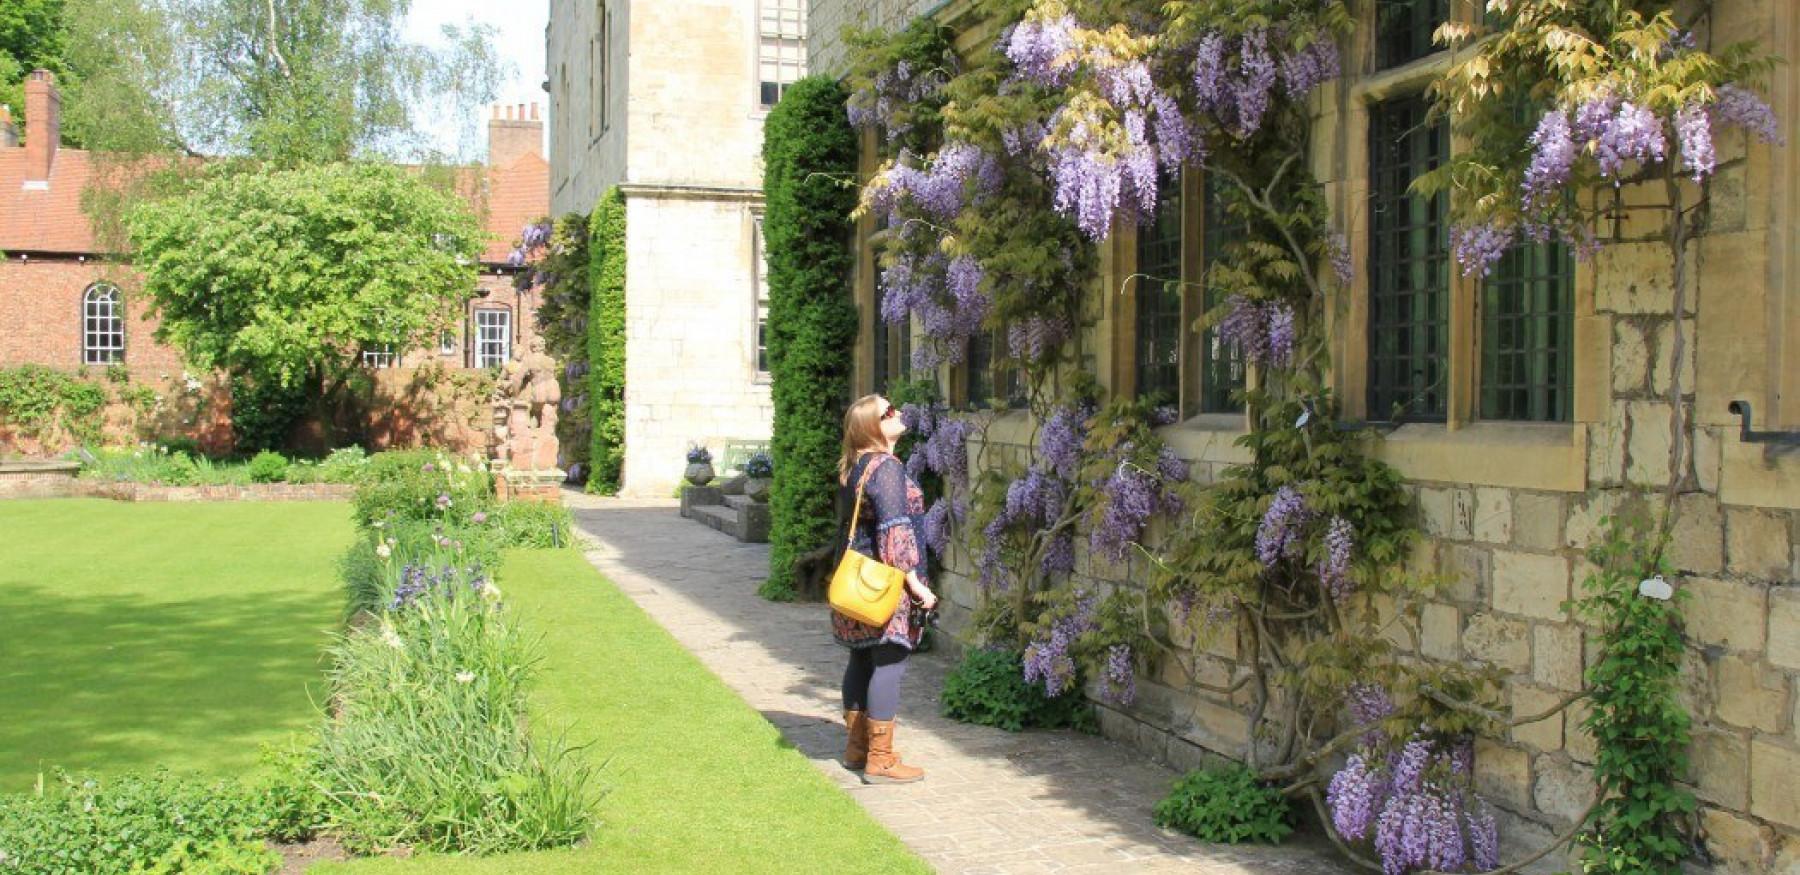 Blog Conversant Traveller Admiring the wisteria at Treasurers House in York